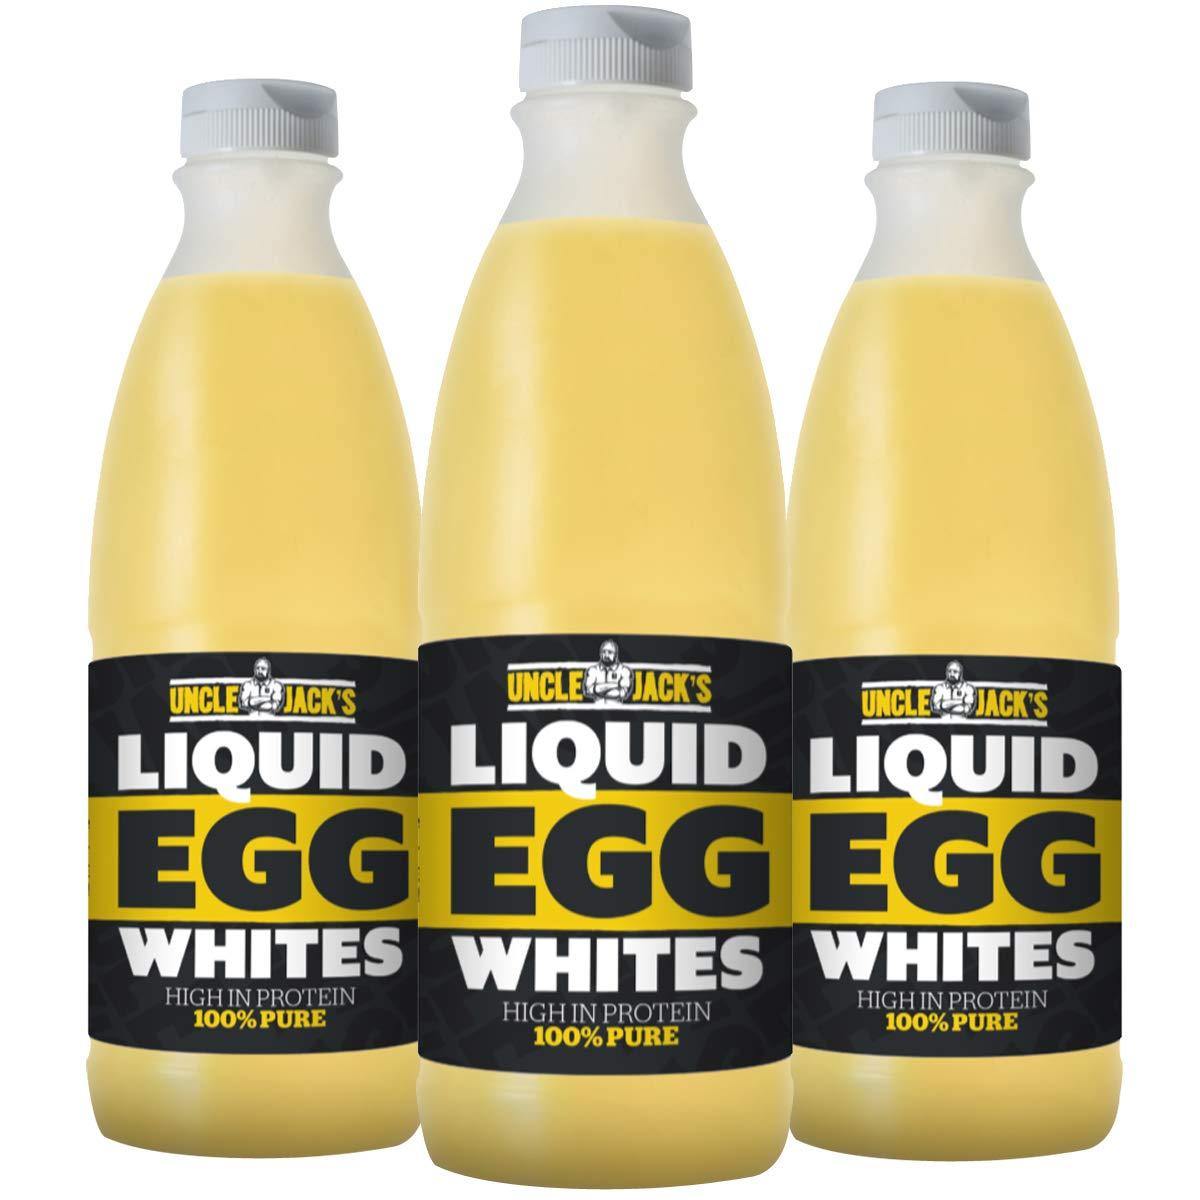 Uncle Jack's Free Range Liquid Egg Whites 3 x 970ml Bottle Eggs Protein